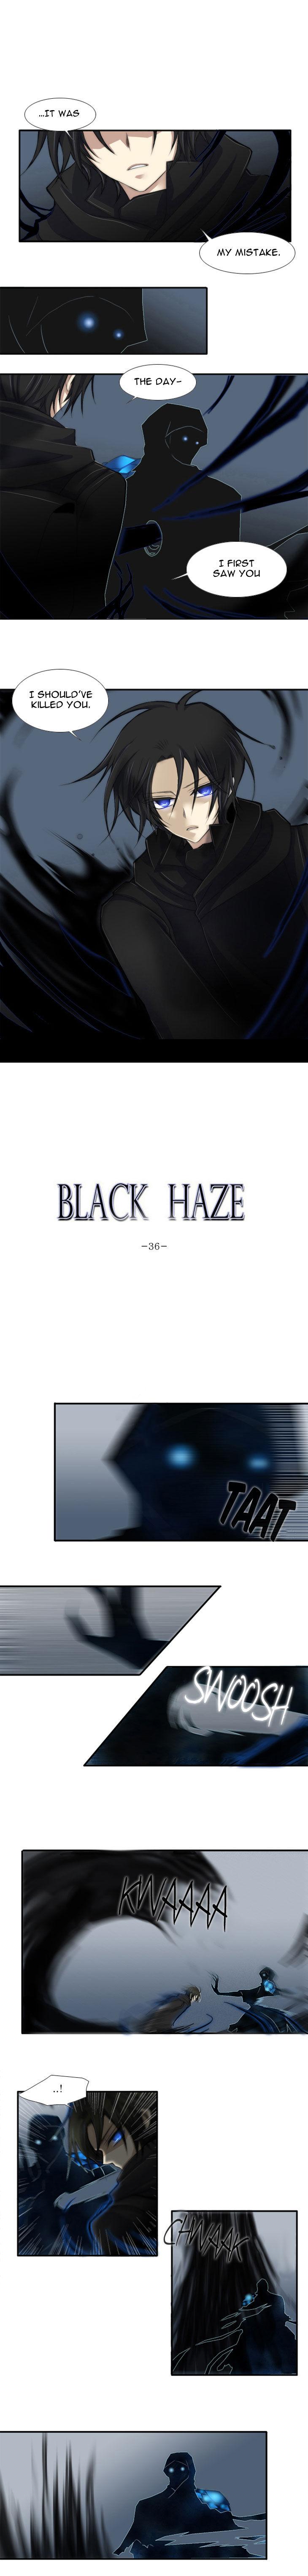 Black Haze 36 Page 2